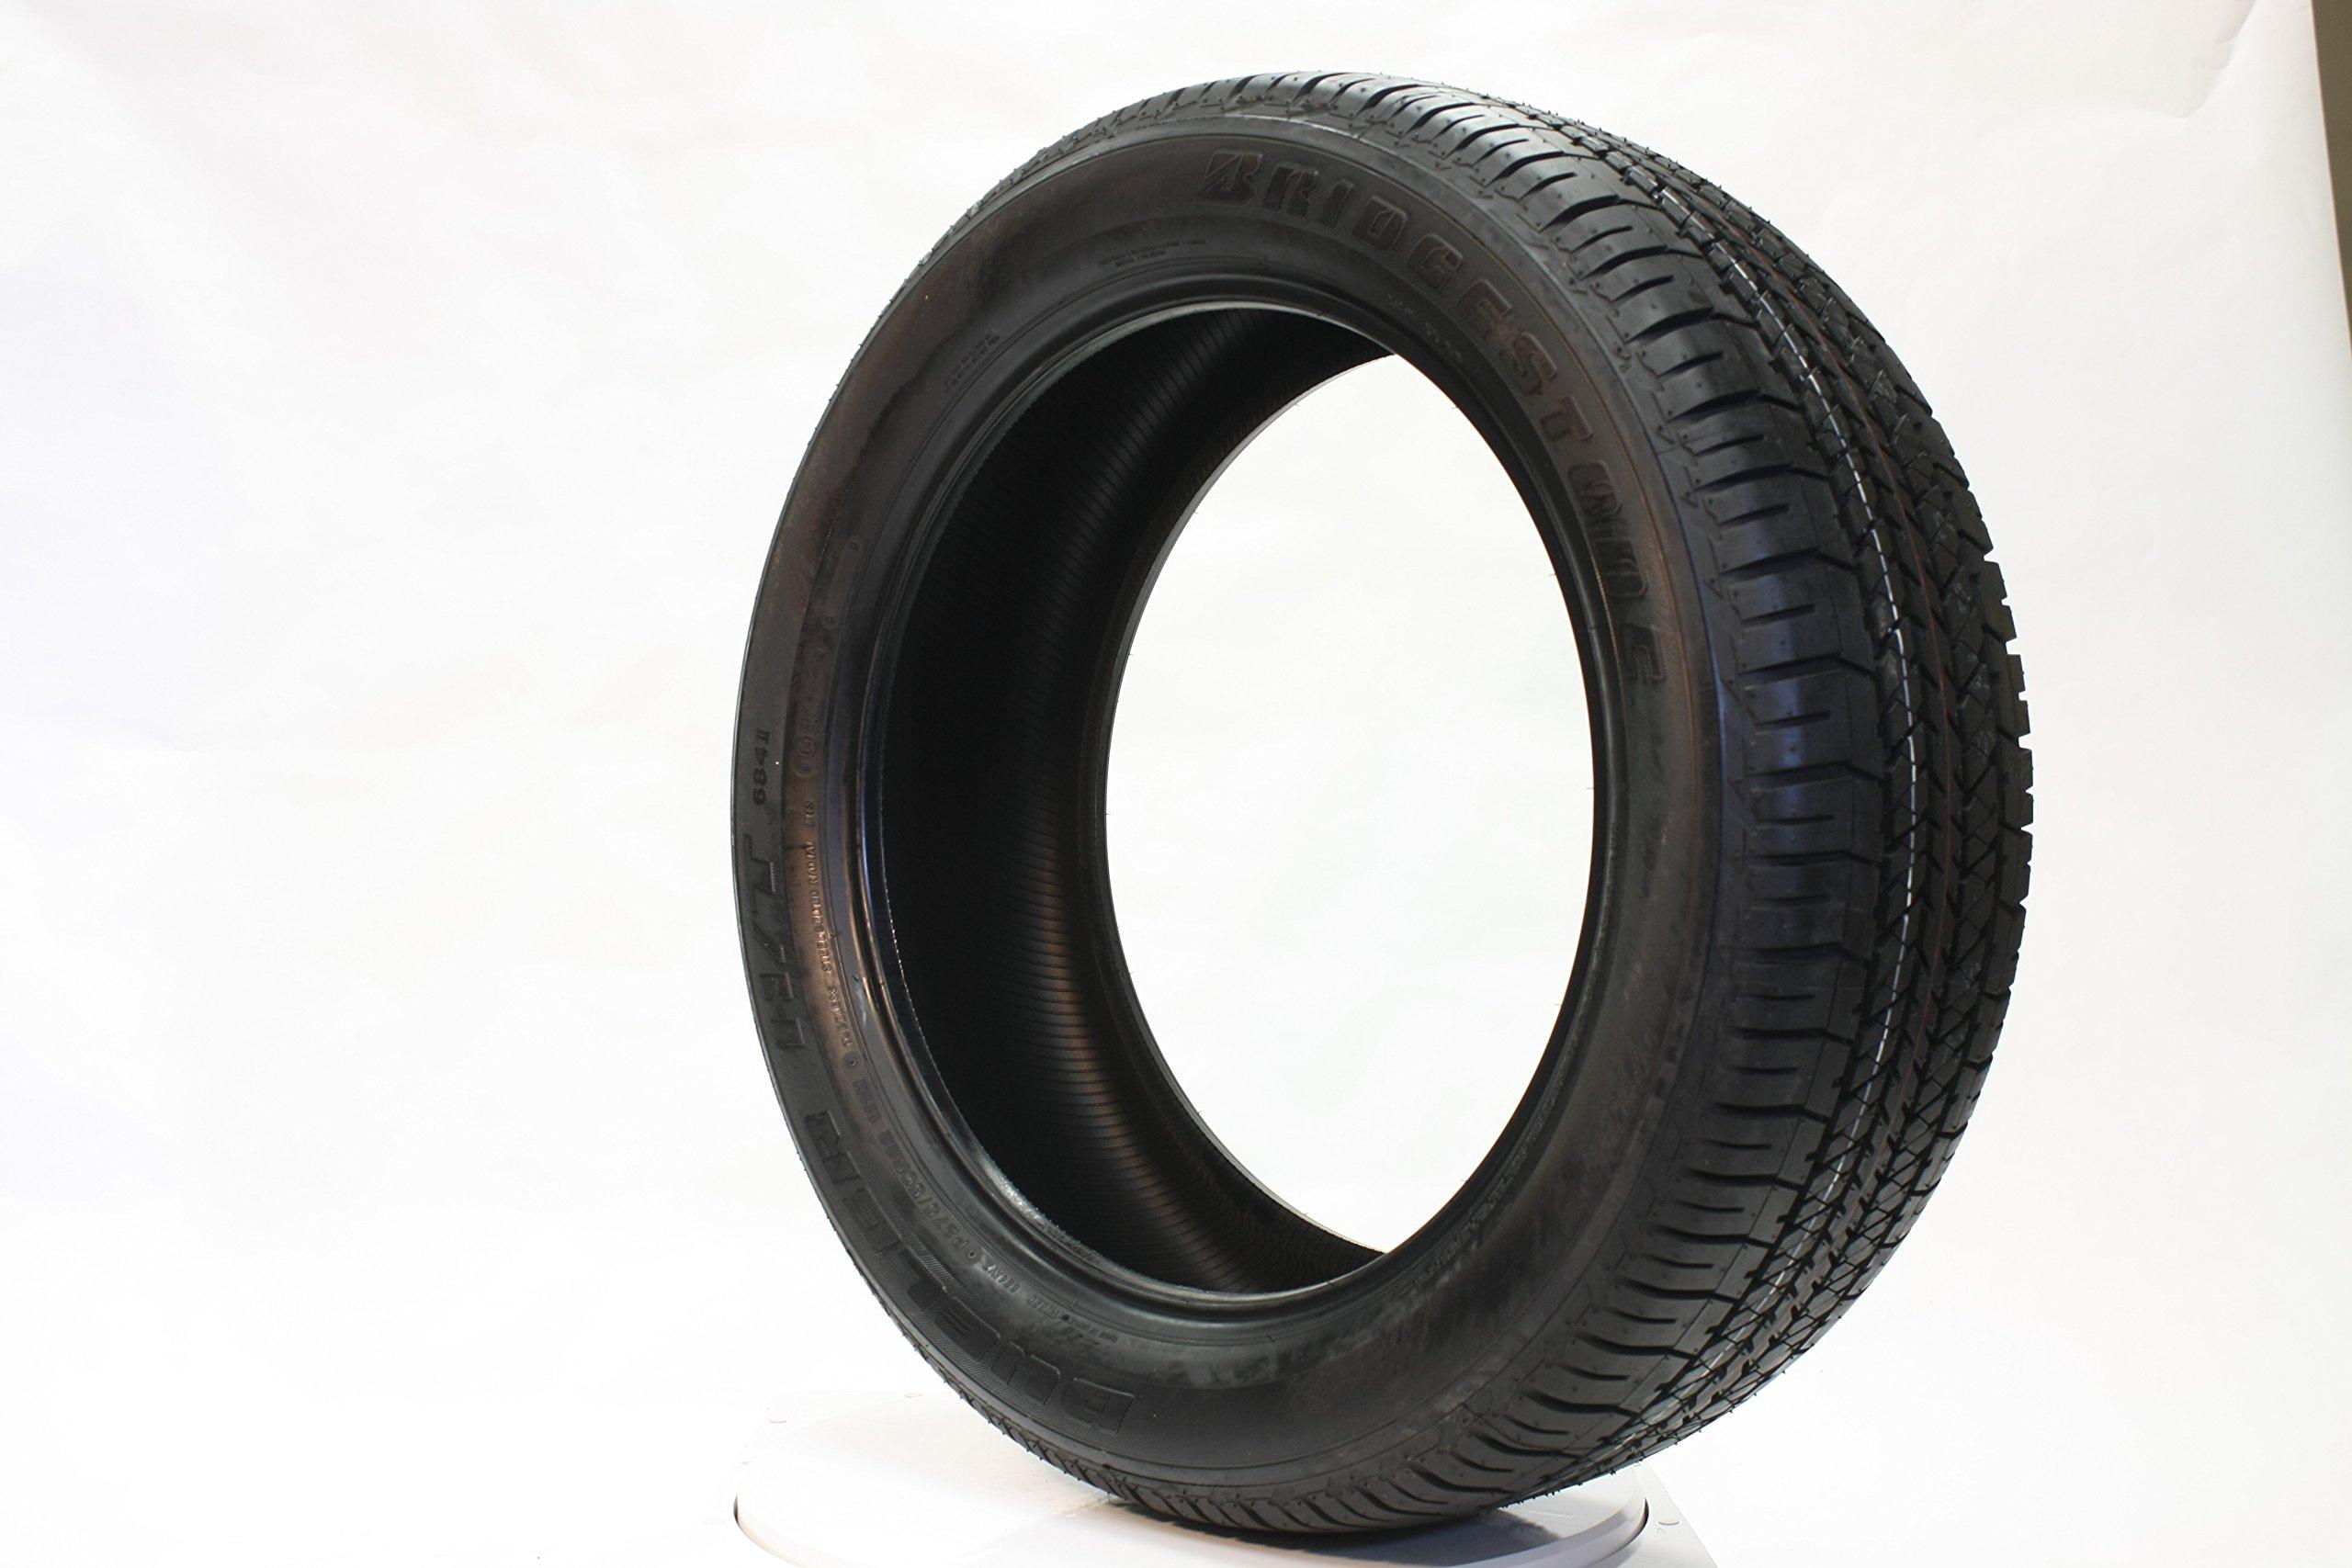 Bridgestone Dueler H/T 684 II All-Season Radial Tire - 255/70R18 112T by Bridgestone (Image #1)